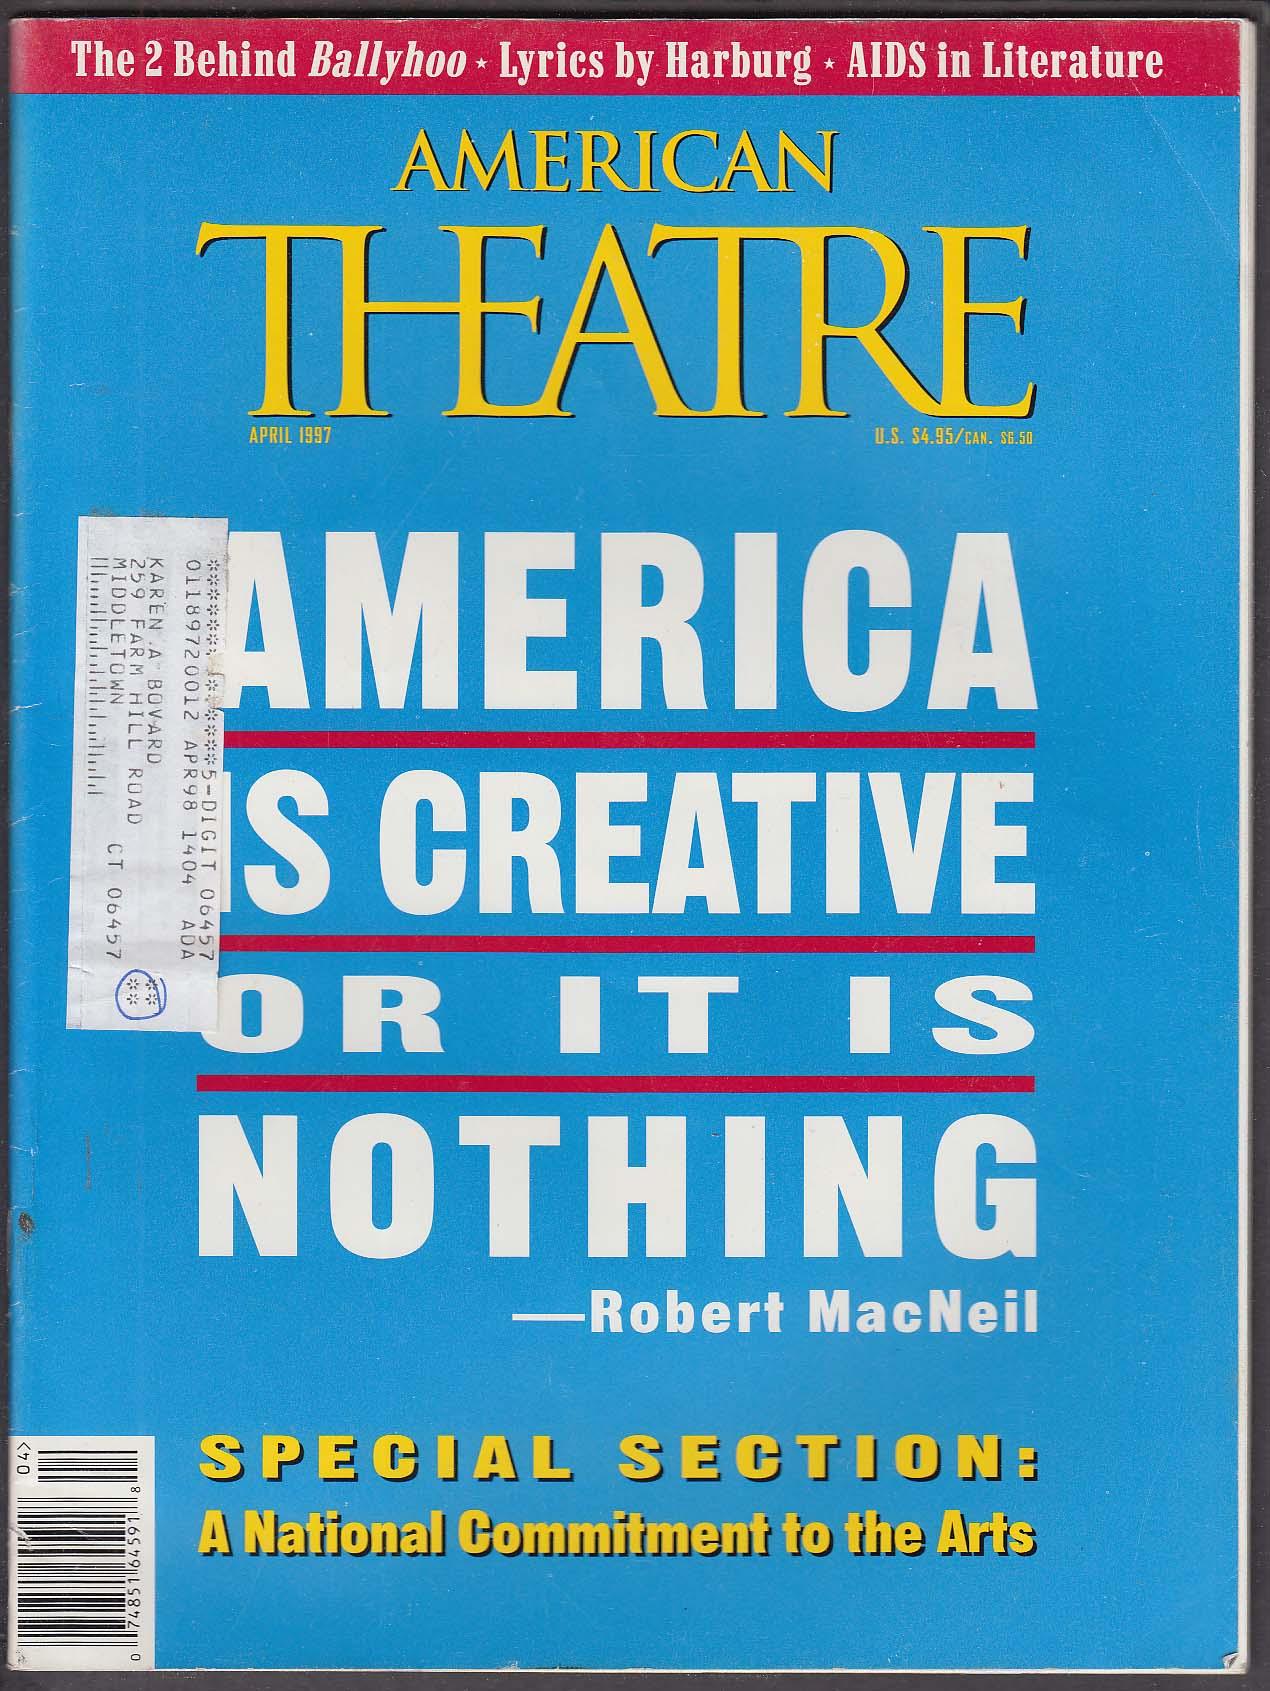 AMERICAN THEATRE Robert MacNeil Rick Lazio Lee Kessler Dana Ivey ++ 4 1997